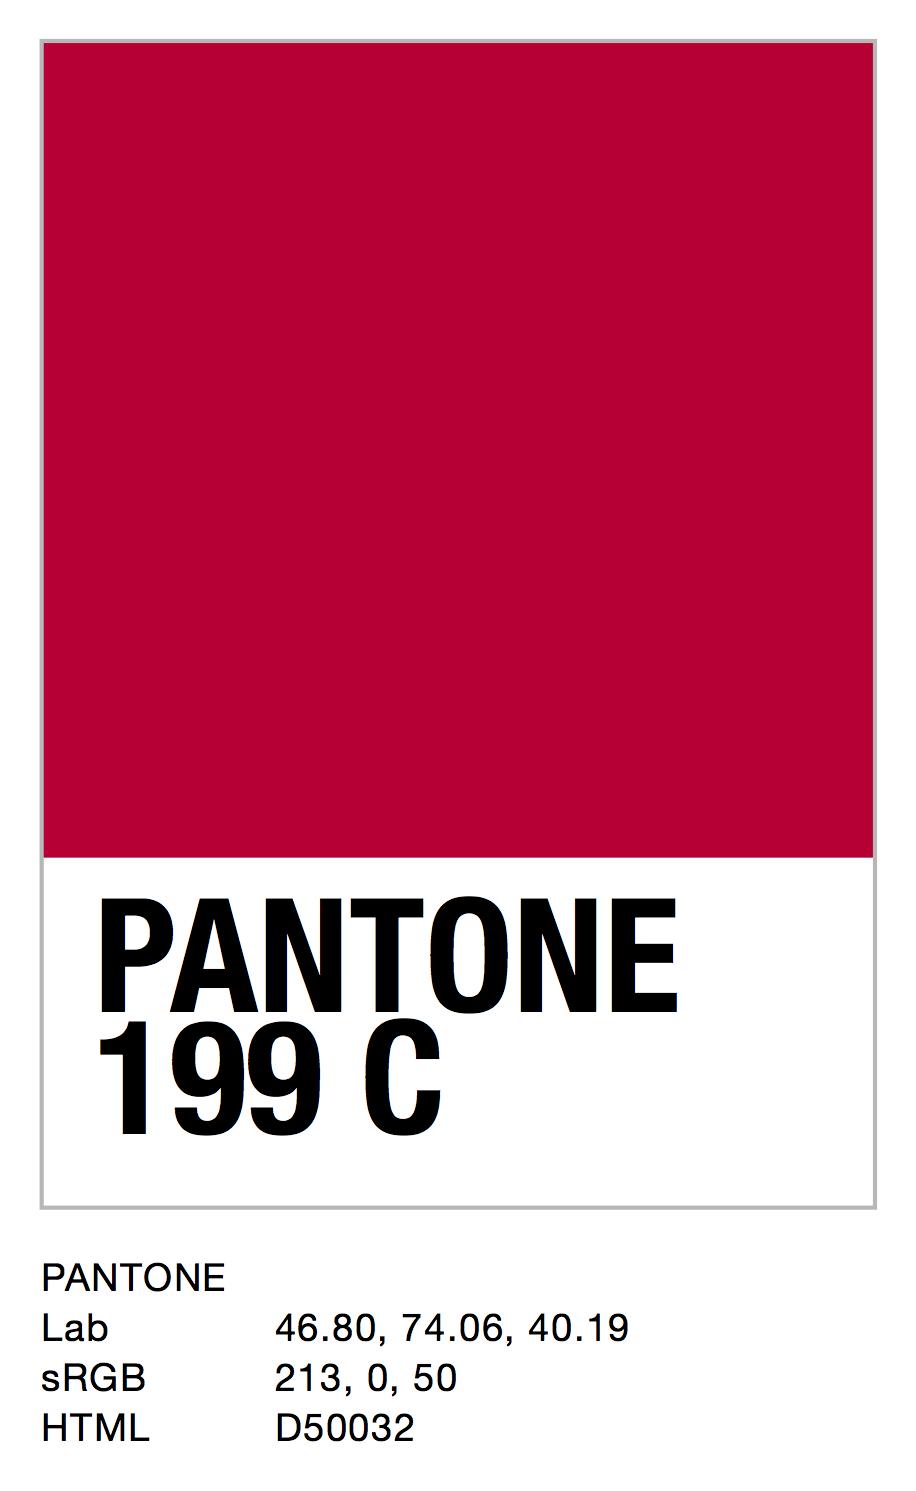 PANTONE 199 C.jpg